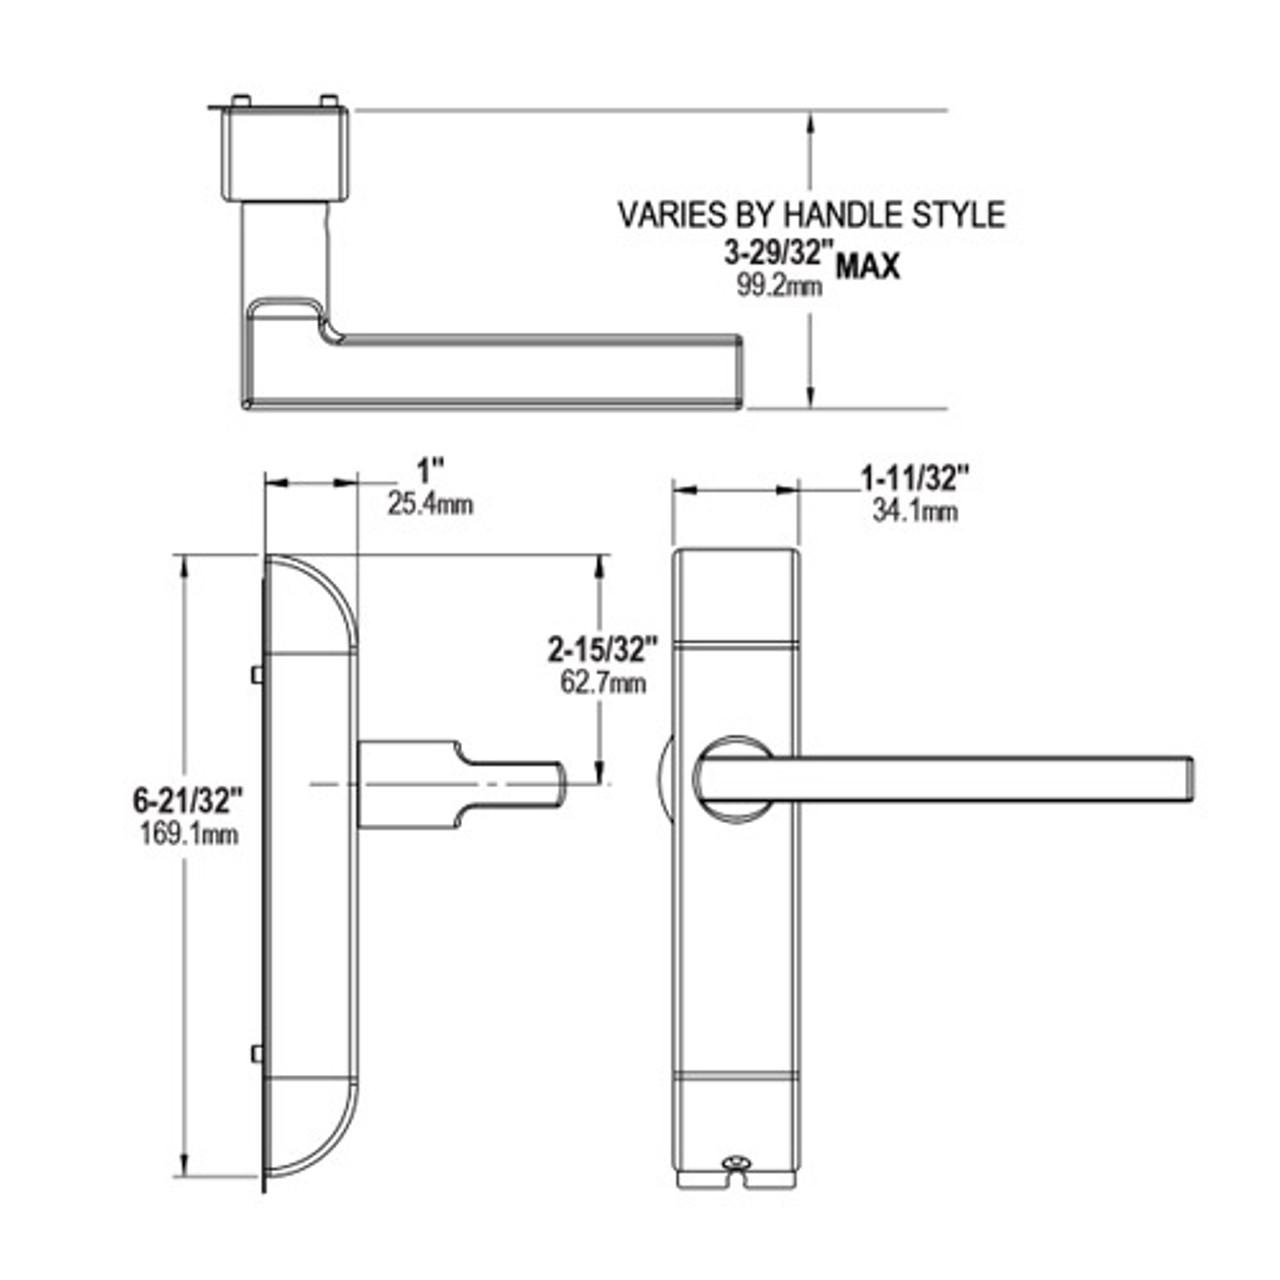 4600M-MW-631-US3 Adams Rite MW Designer handle Dimensional View